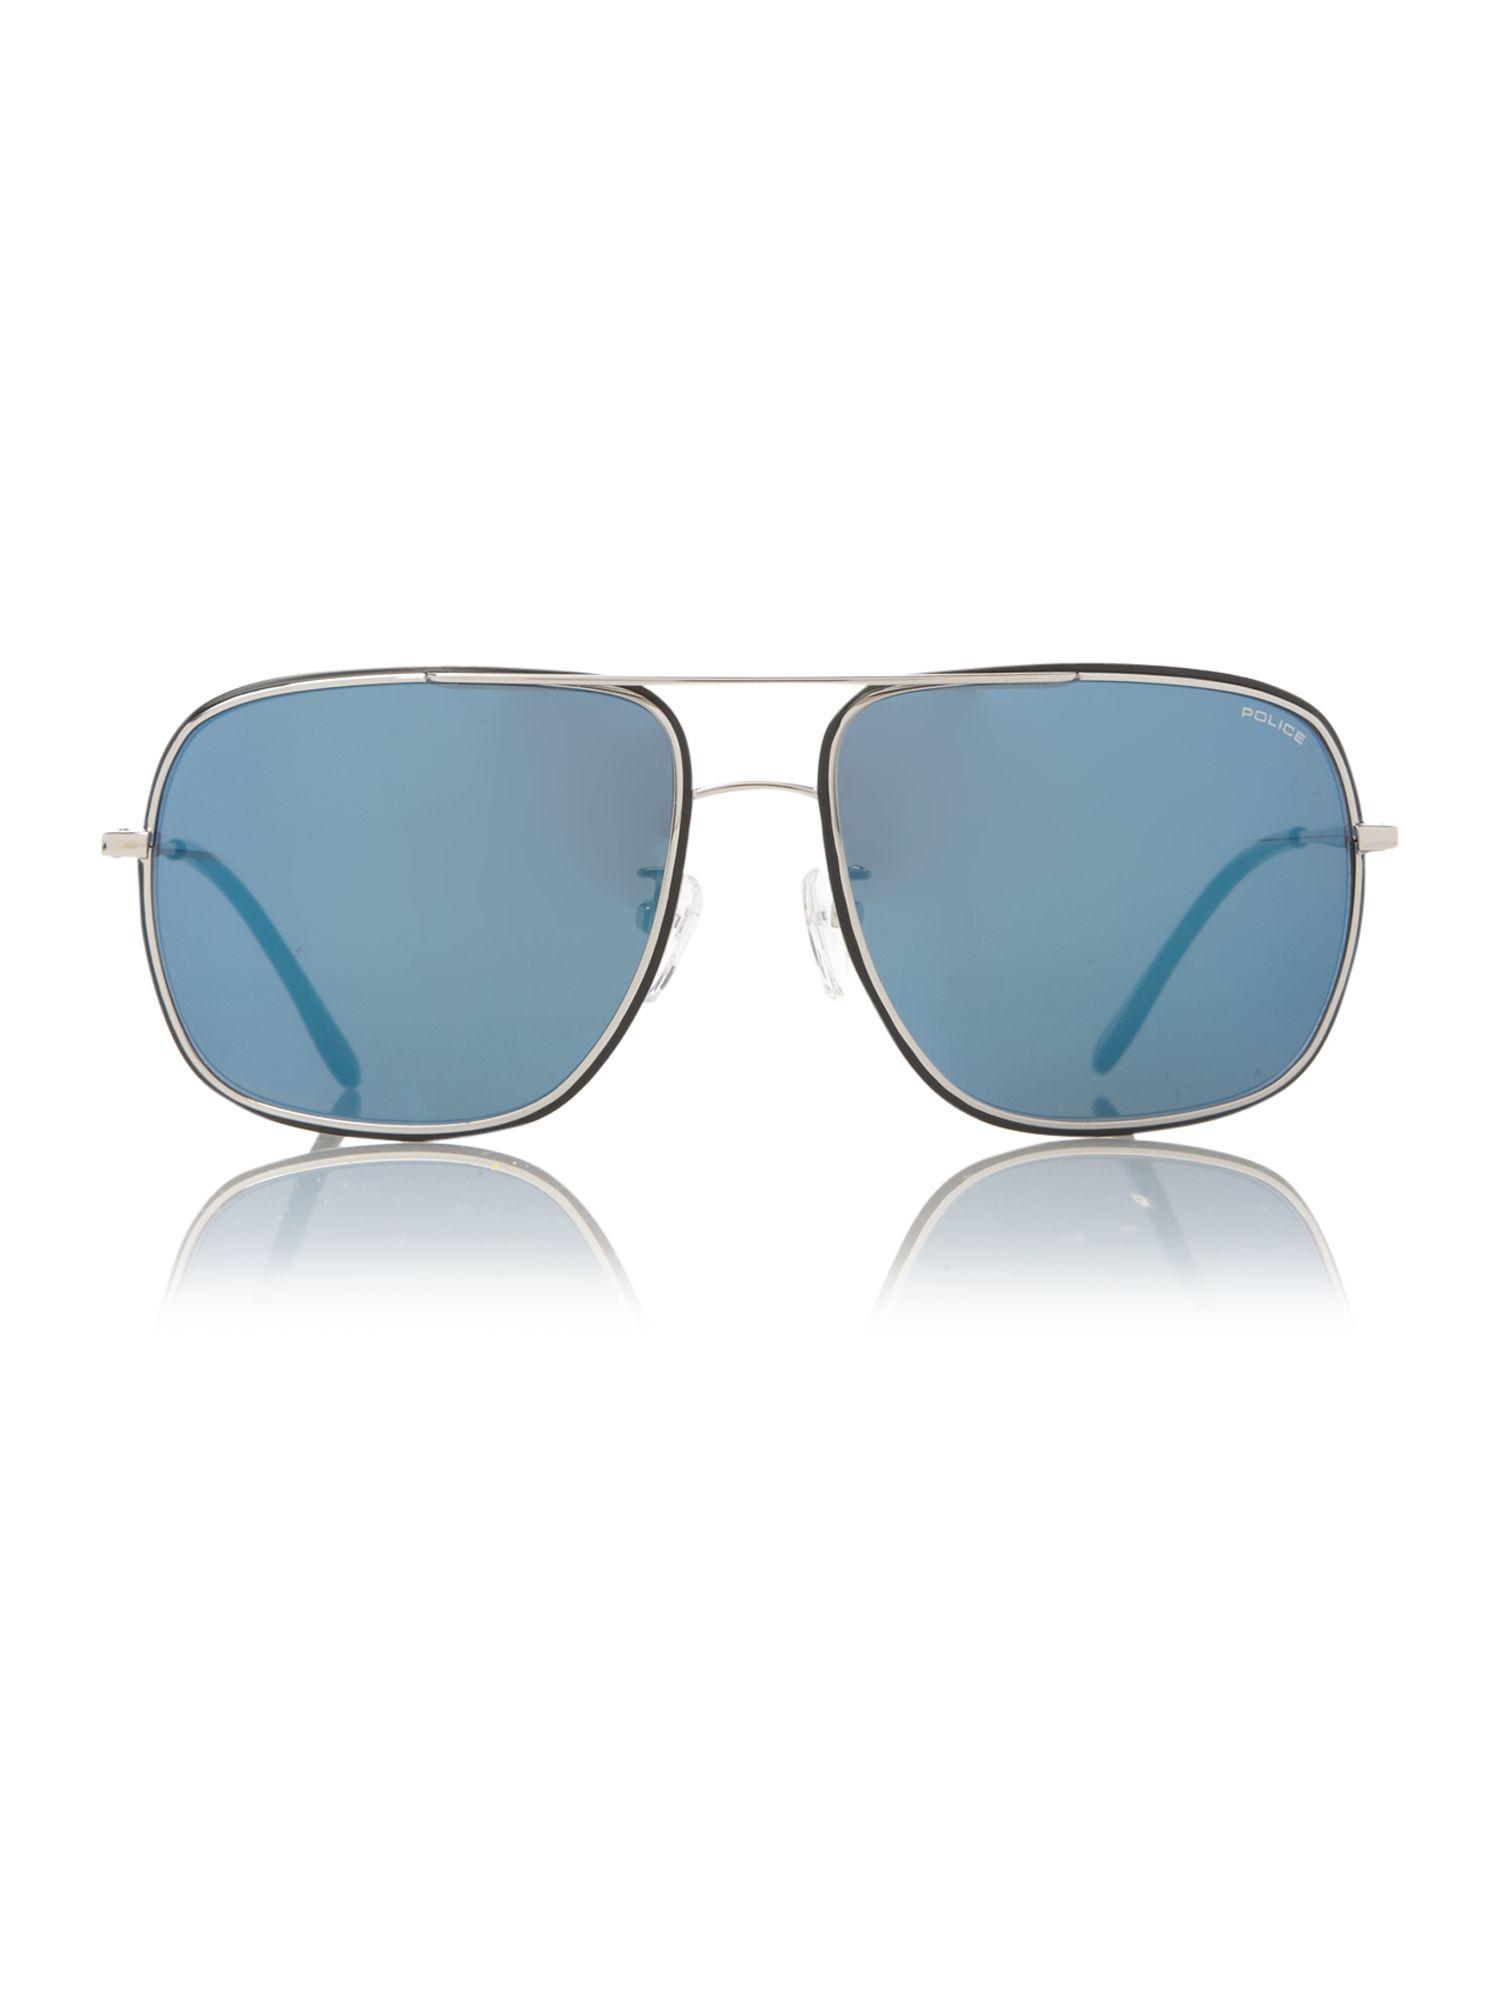 ray ban aviator 3025 azul degrade